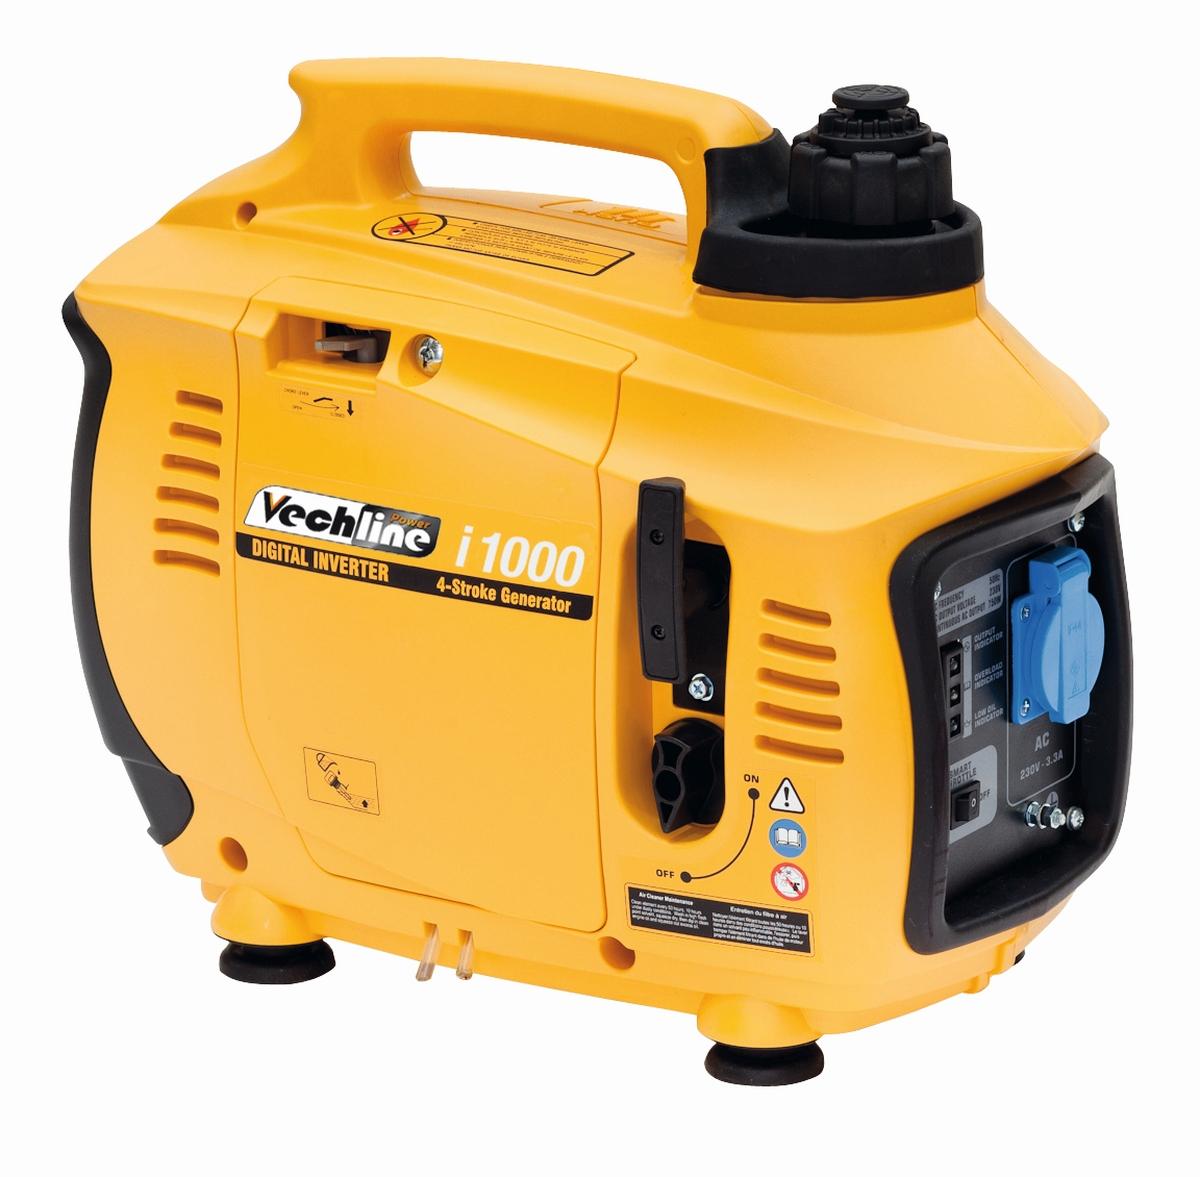 VECHLINE-Generator i1000